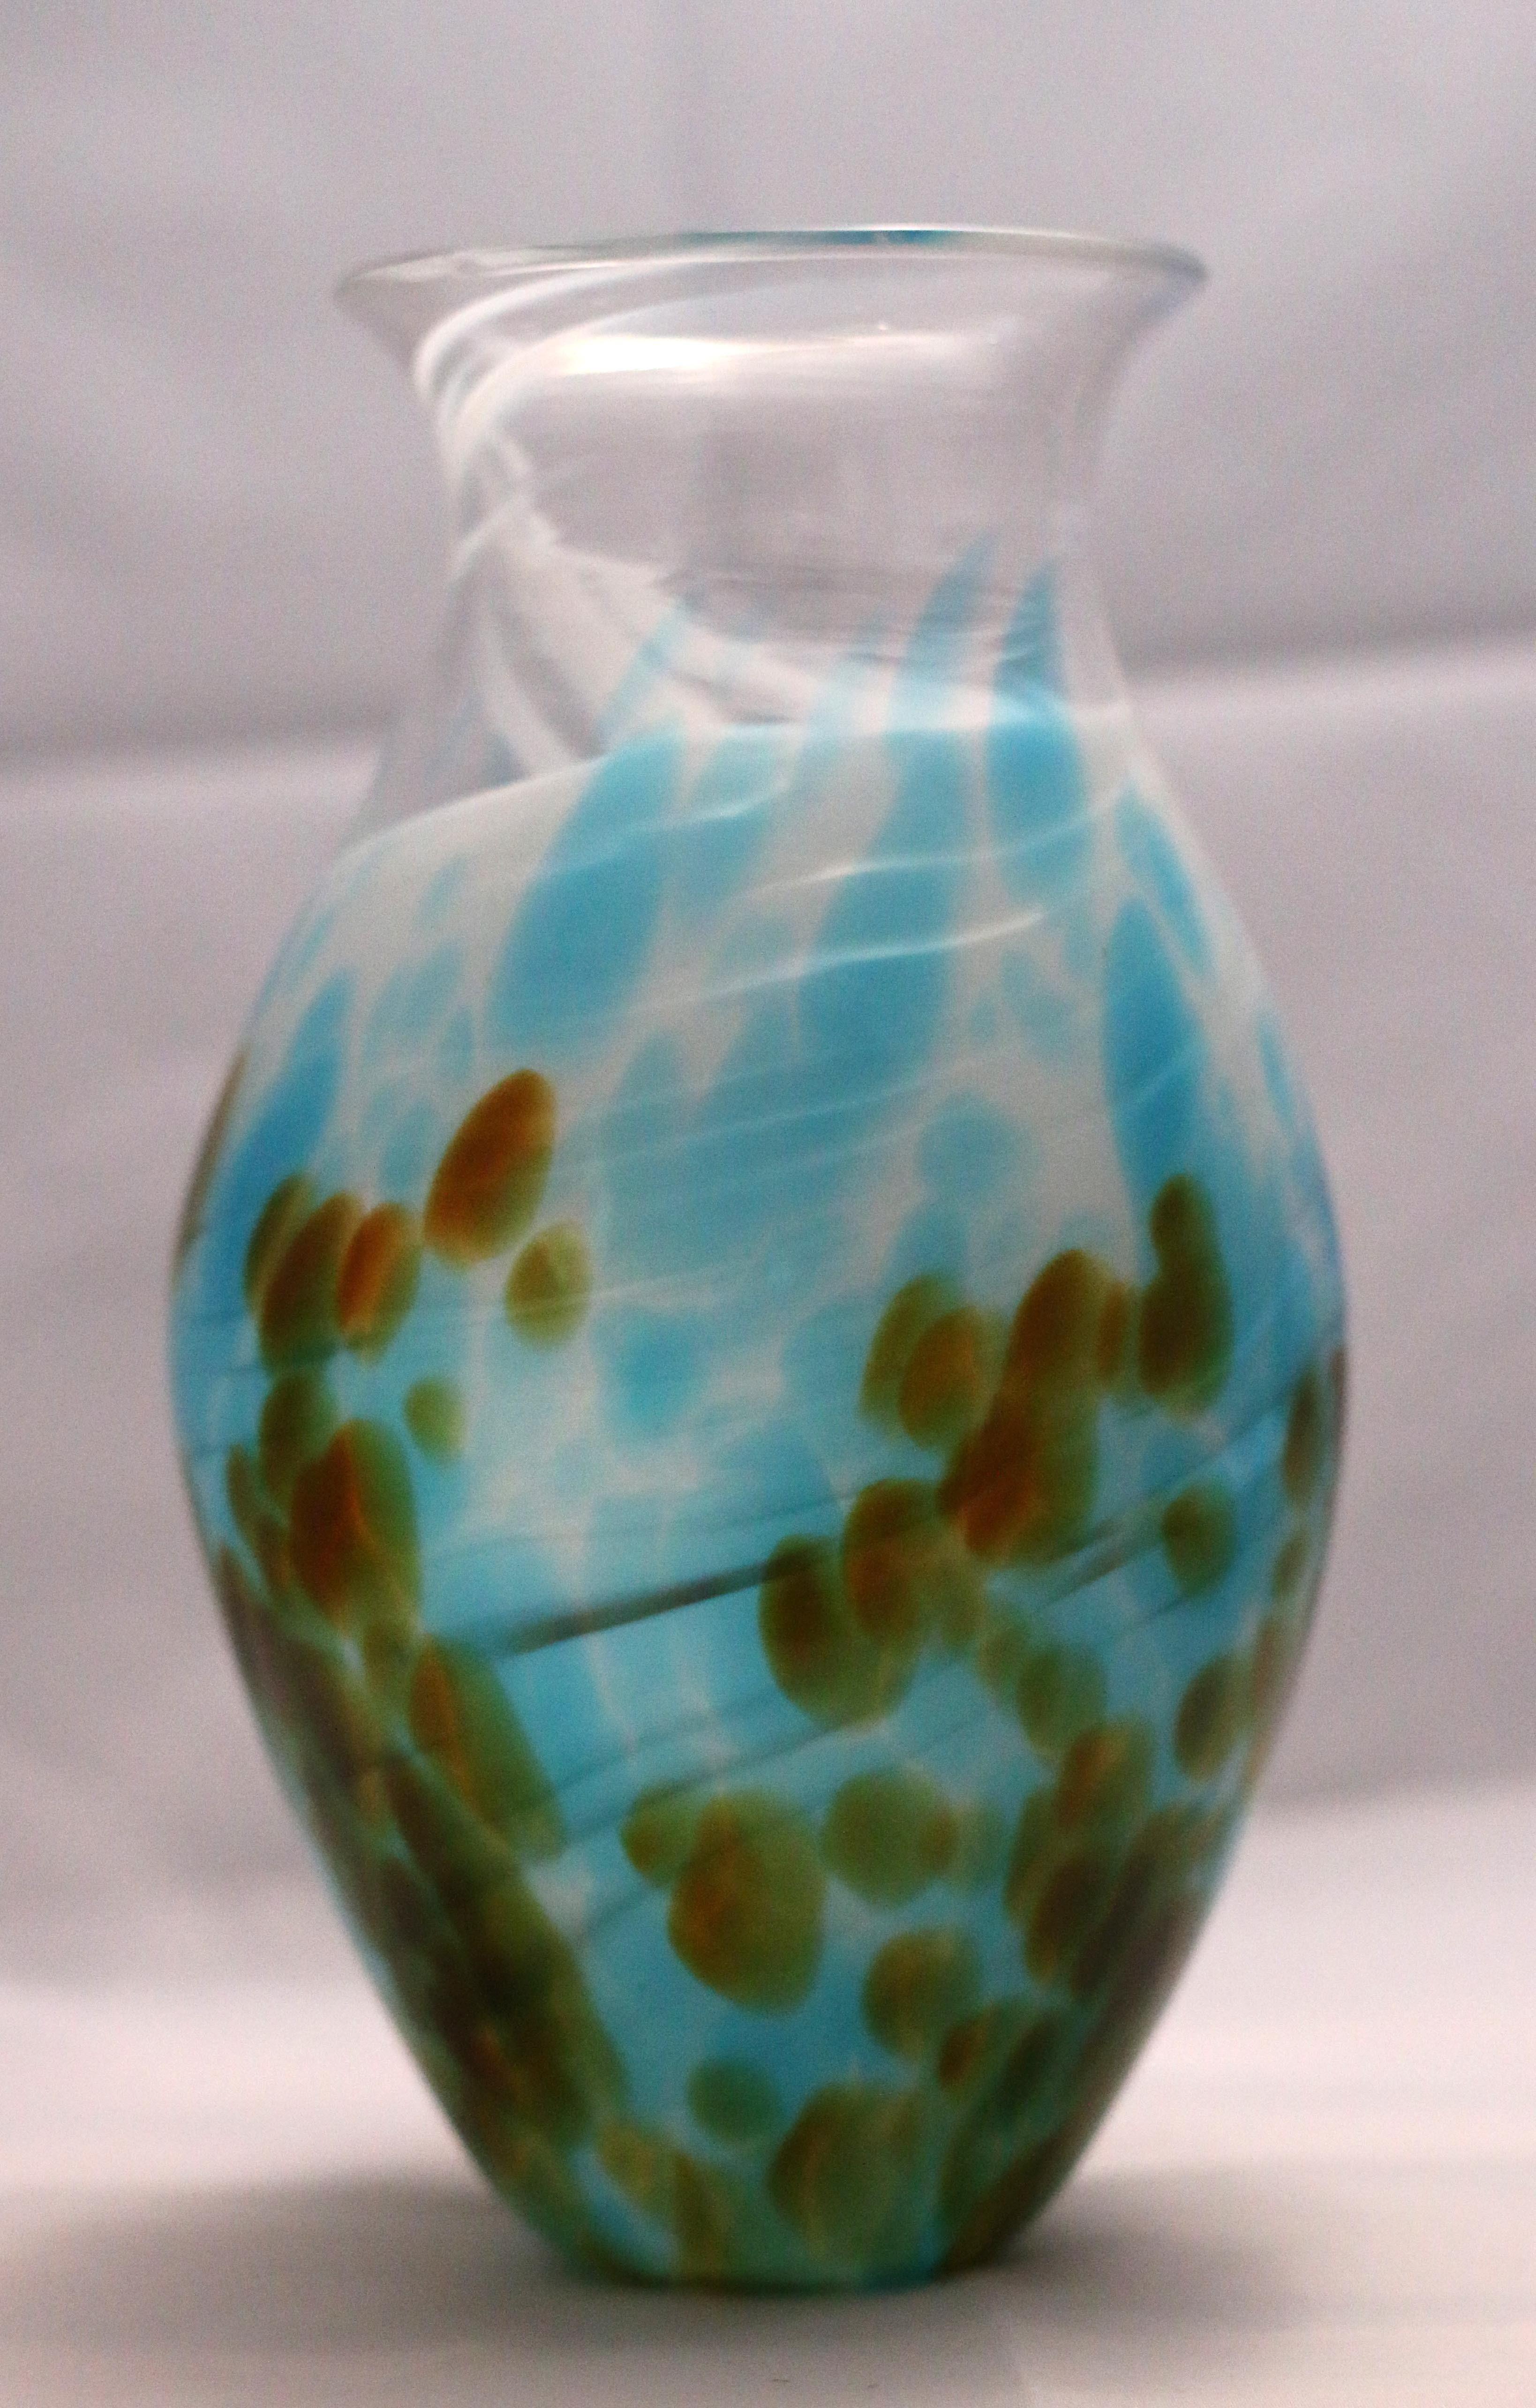 milk jug bud vase of 22 hobnail glass vase the weekly world throughout white milk glass vases bulk glass designs